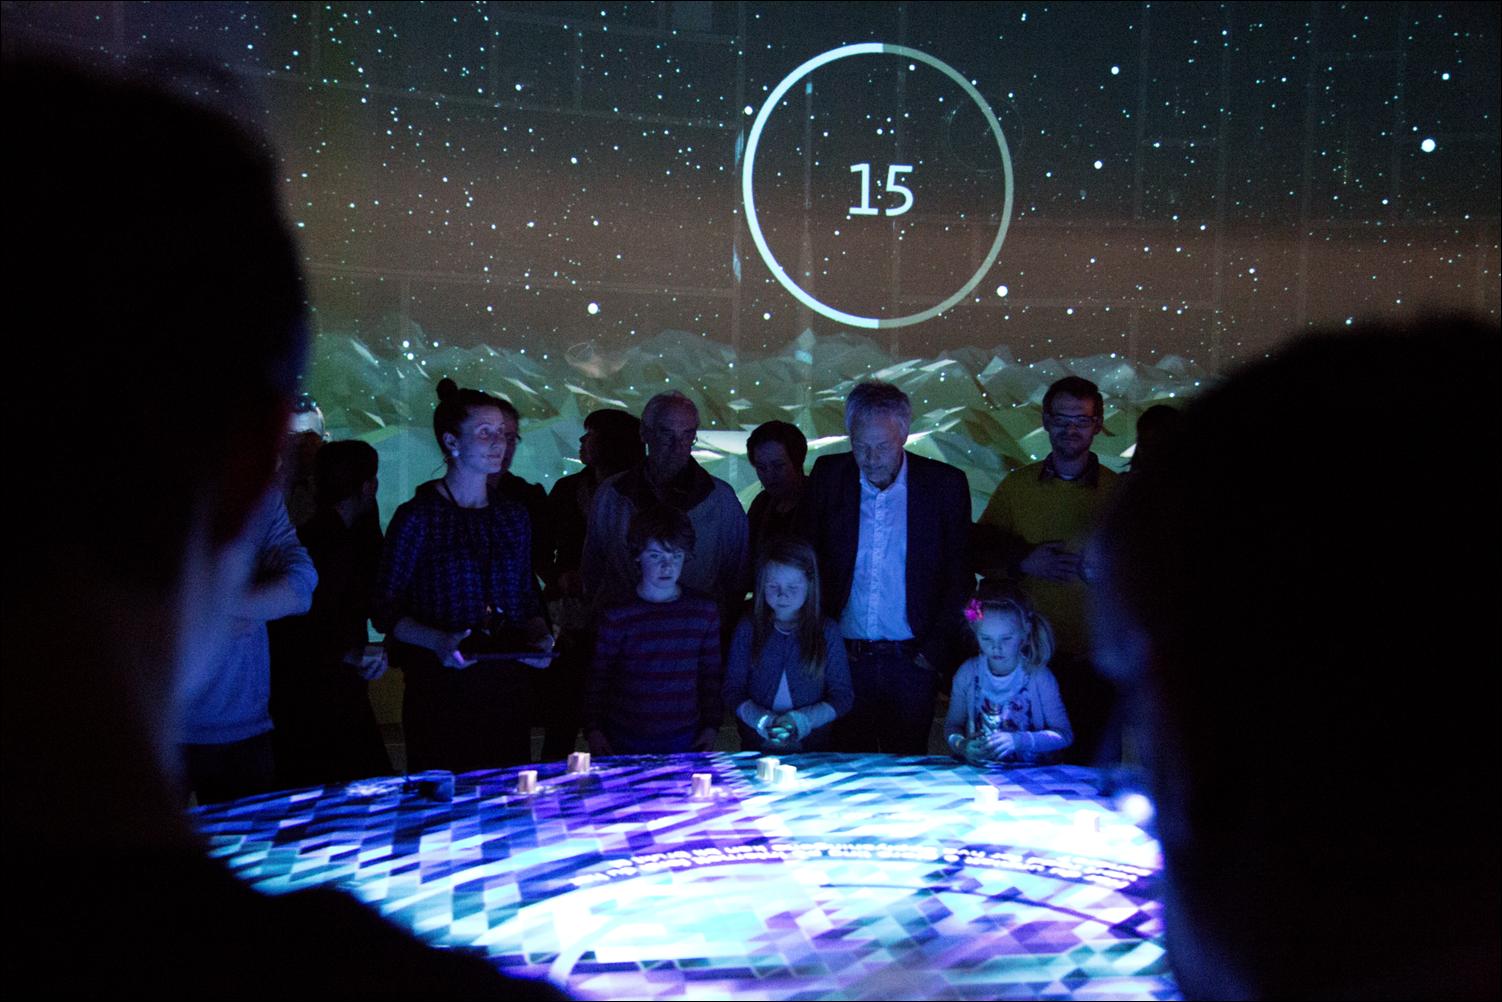 #EcsiteAwards winner 2015: Norsk Teknisk Museum for TING exhibition